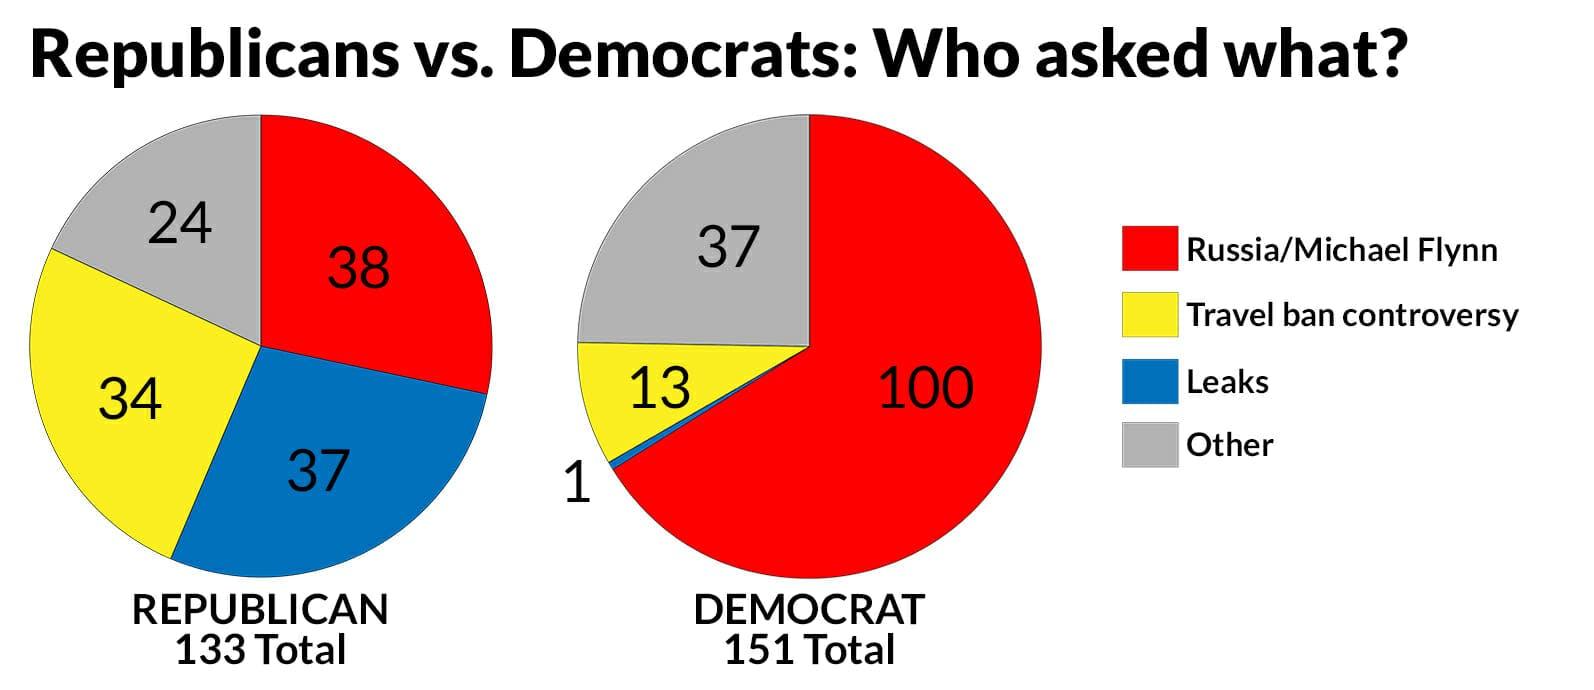 Clapper/Yates question breakdown by party